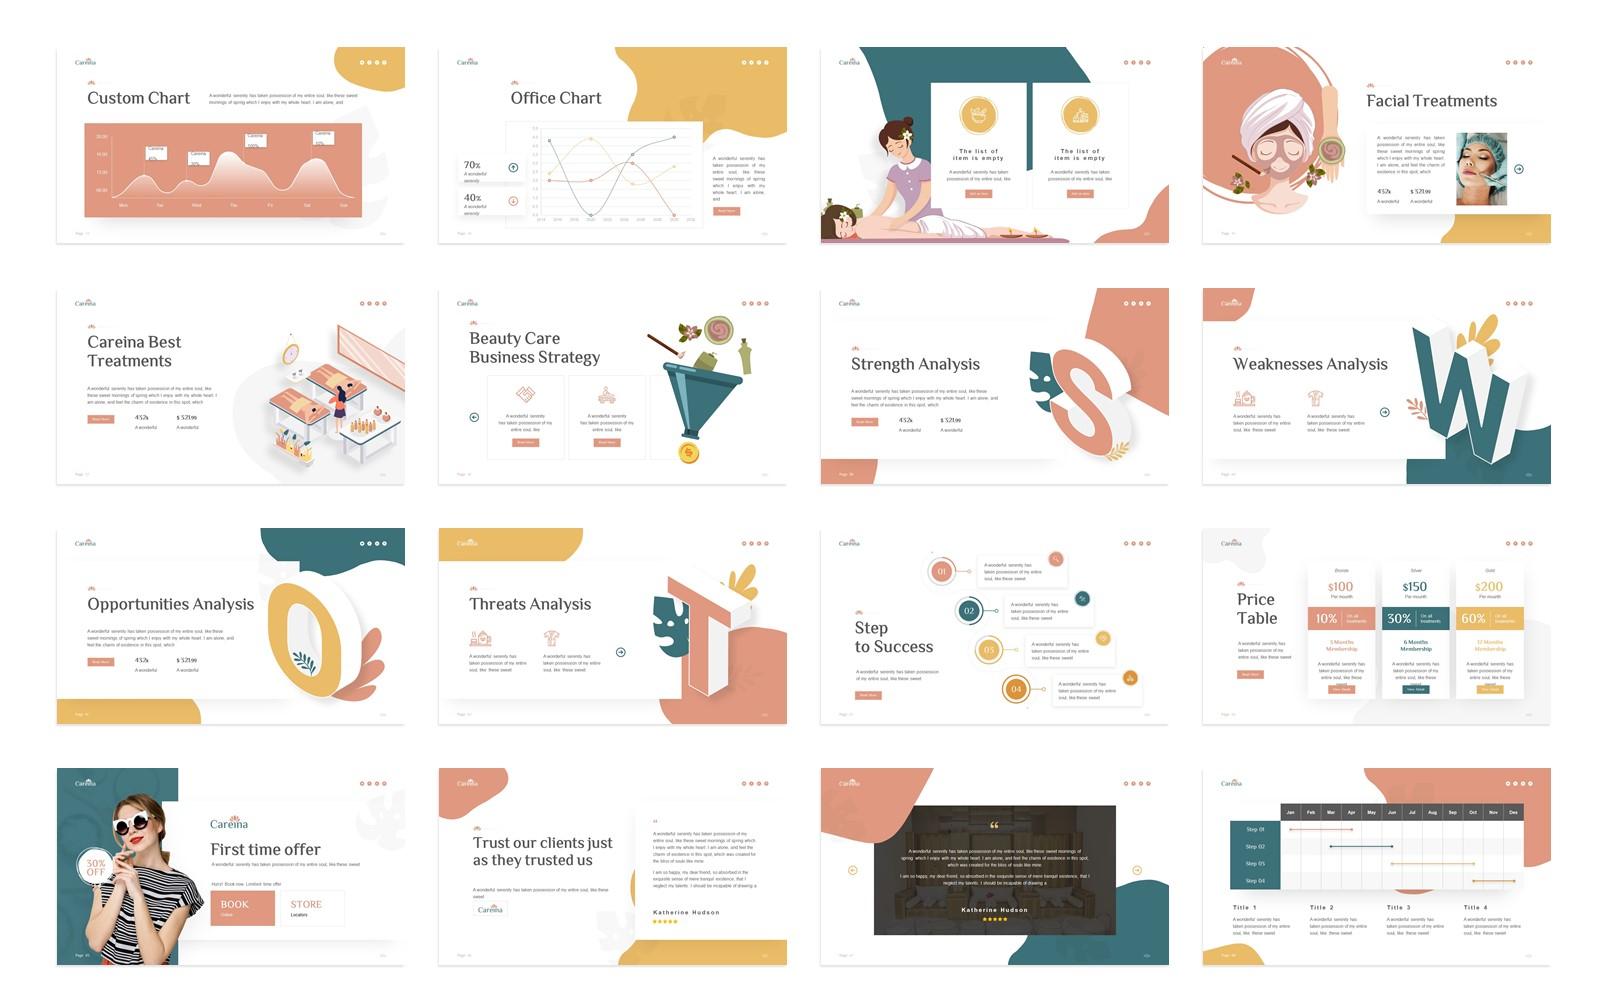 Careina - Spa Simple Minimalis PowerPoint Template